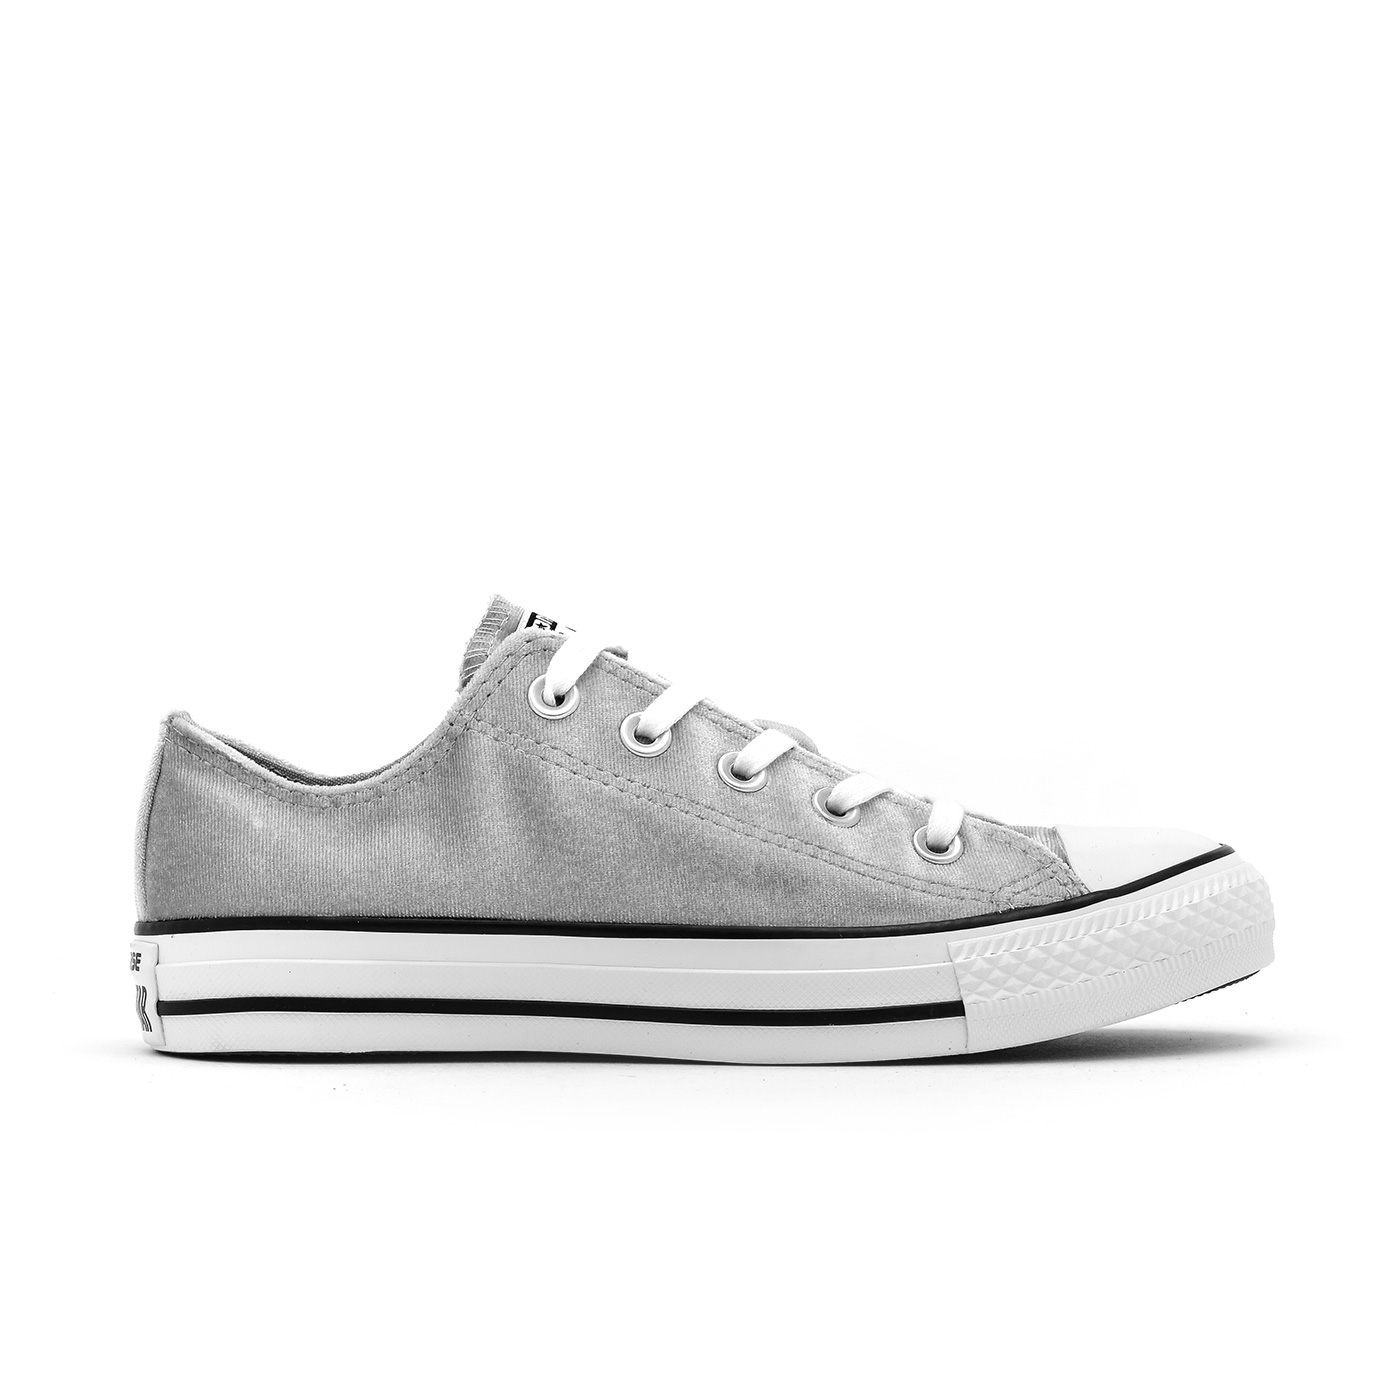 9e53ead5de7ffb Converse Women s Chuck Taylor All Star Ox Velvet Shoes-Wolf Grey ...